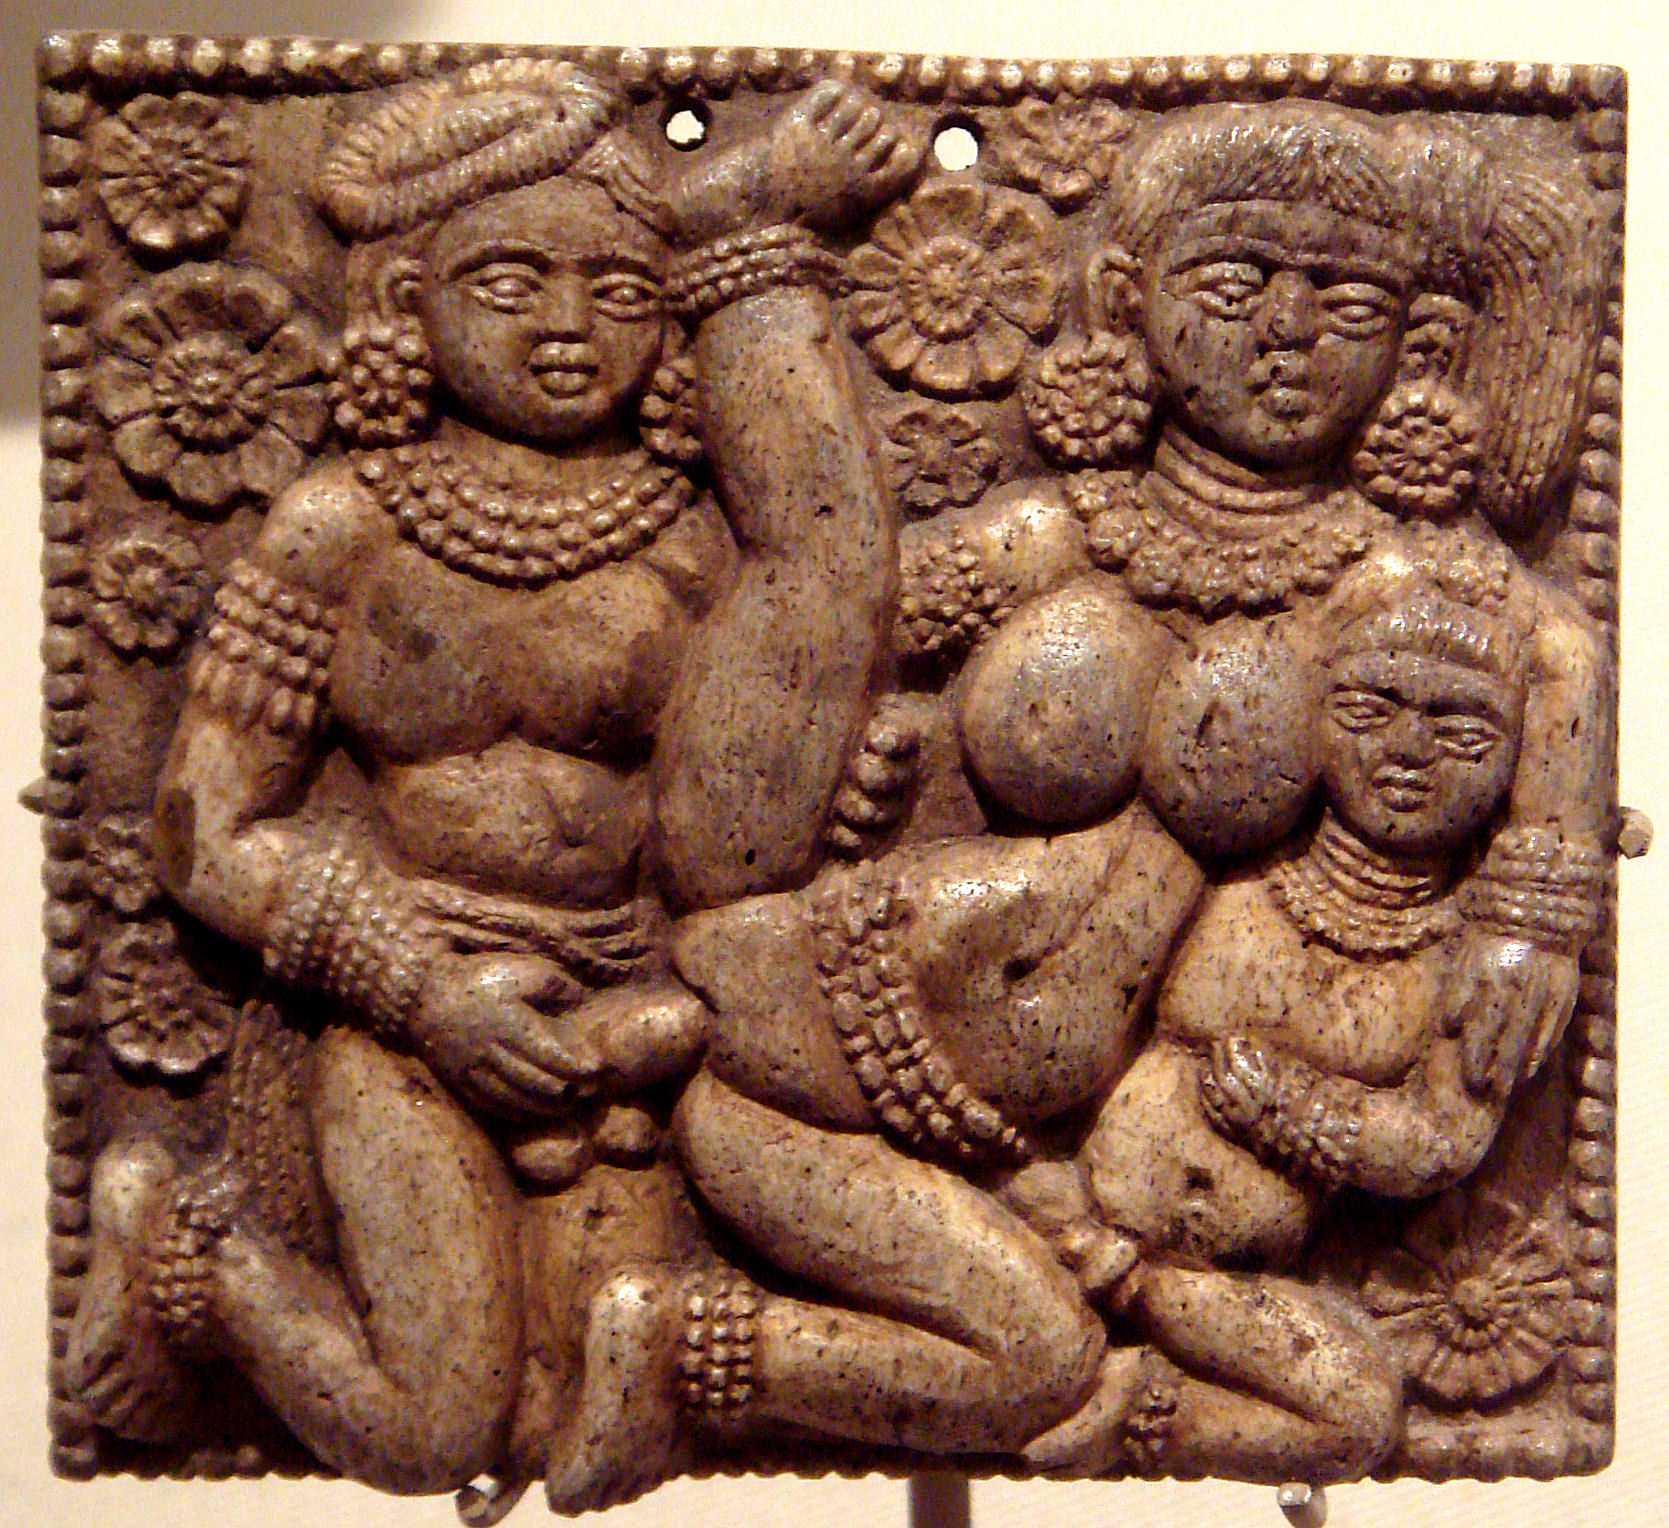 seksualnaya-kultura-indii